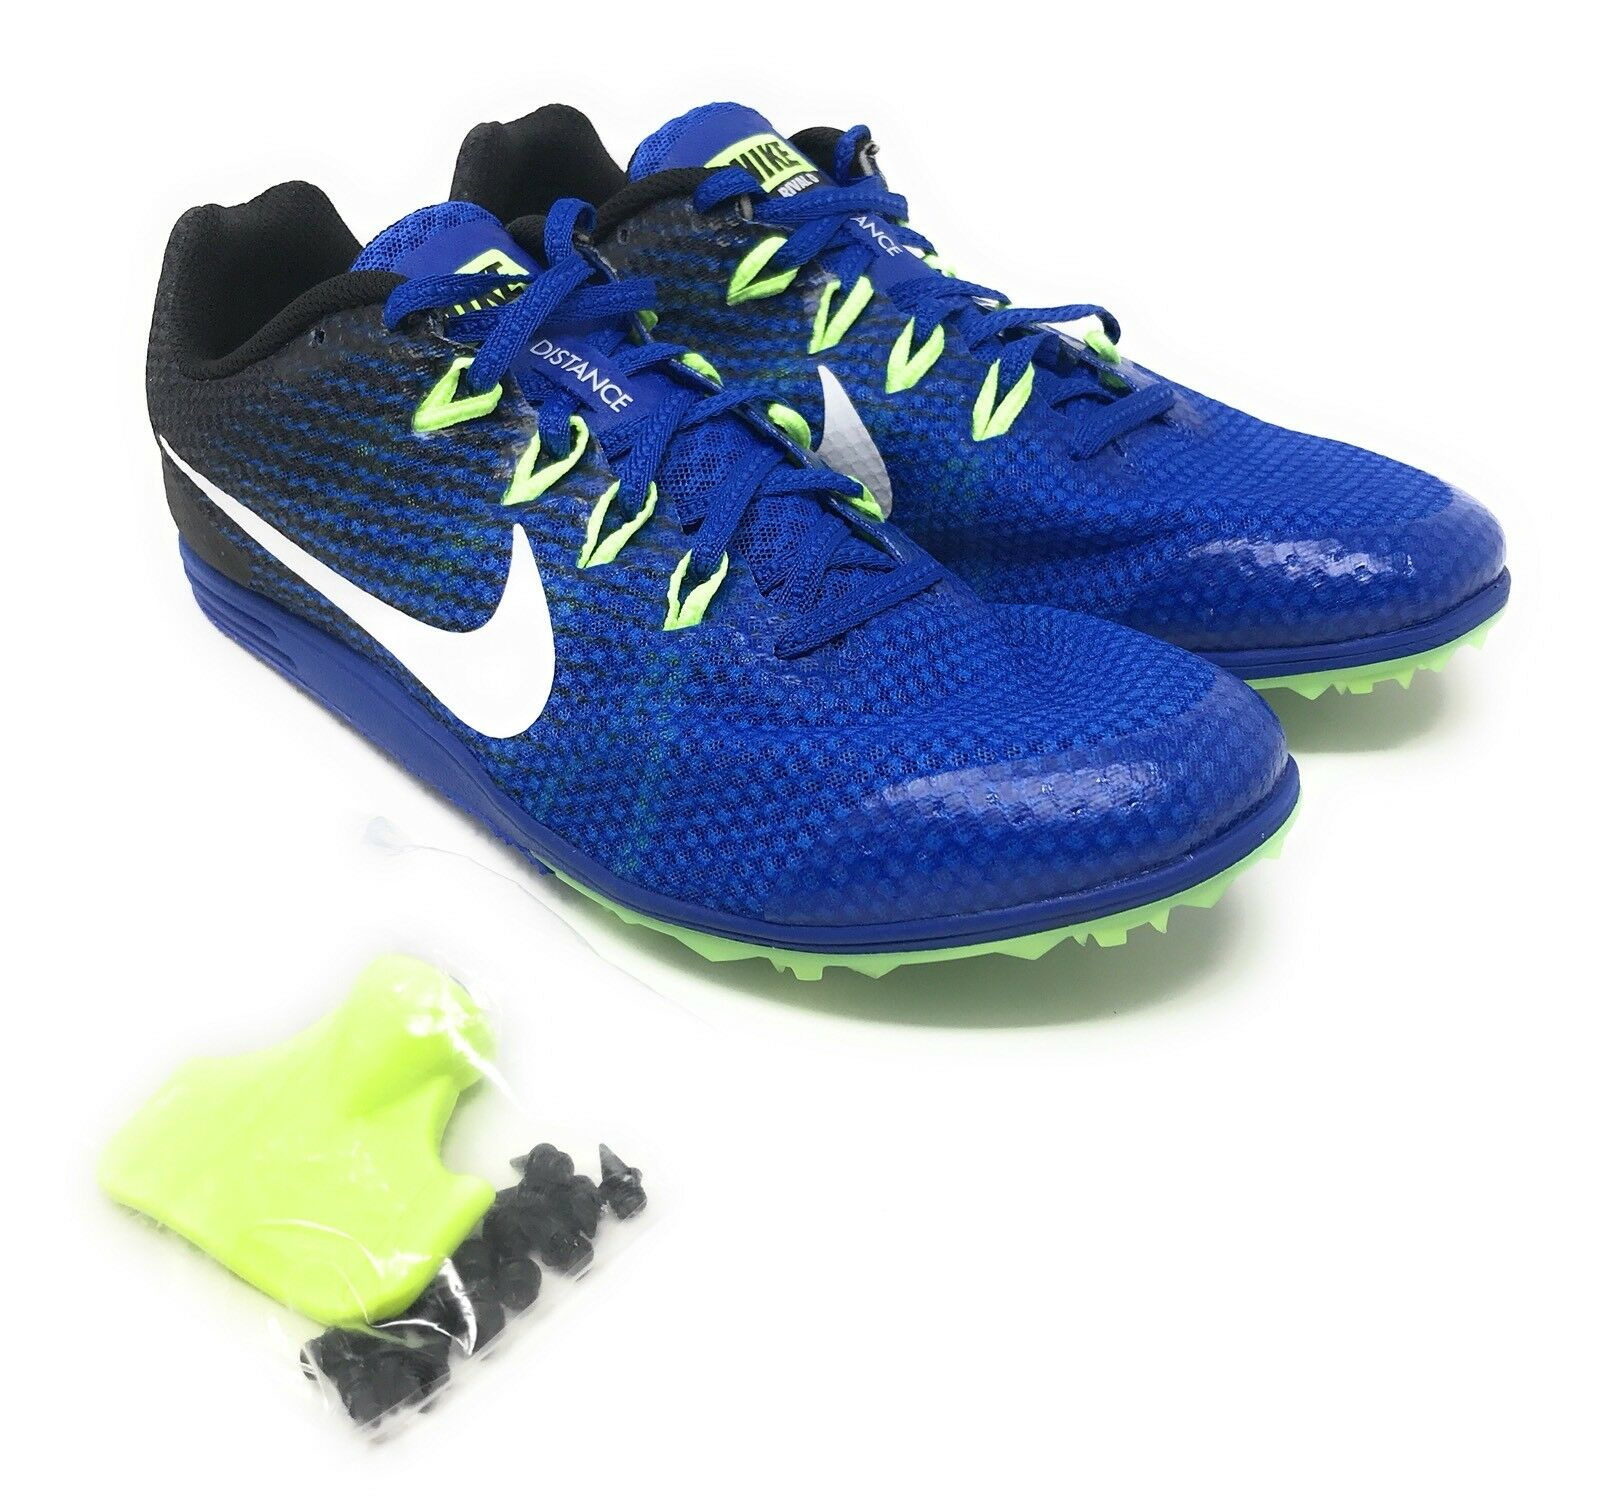 New Nike Zoom Rival D 9 Track Shoes Men's Blue/Black/White? 806556-413?Size 10